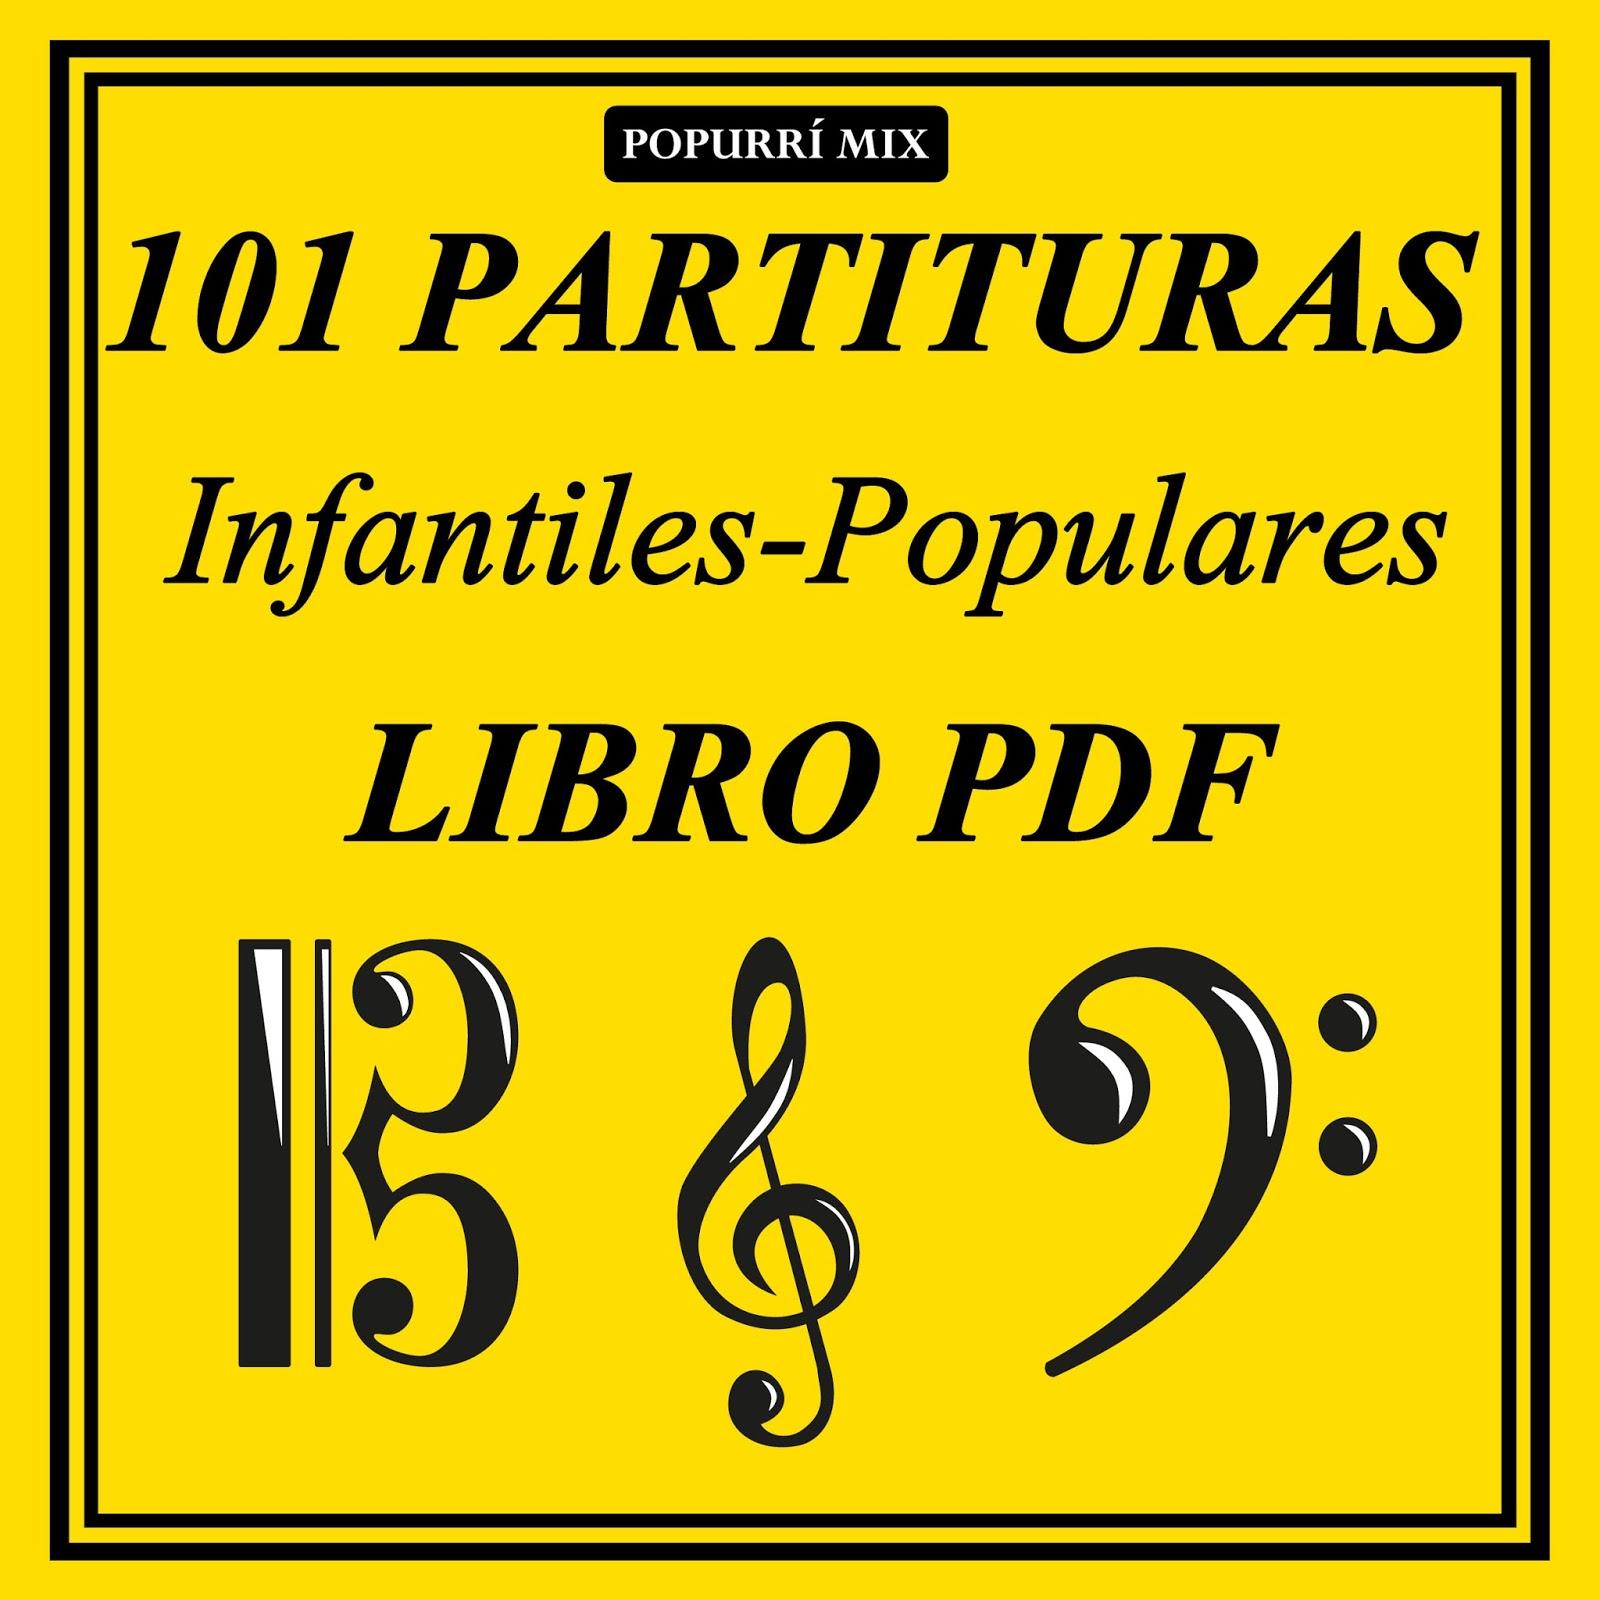 Las Tres Hojas Partitura de Flauta, Violín, Saxofón Alto, Trompeta, Viola, Oboe, Clarinete, Saxo Tenor, Soprano Sax, Trombón, Fliscorno, chelo, Fagot, Barítono, Bombardino, Trompa o corno, Tuba...